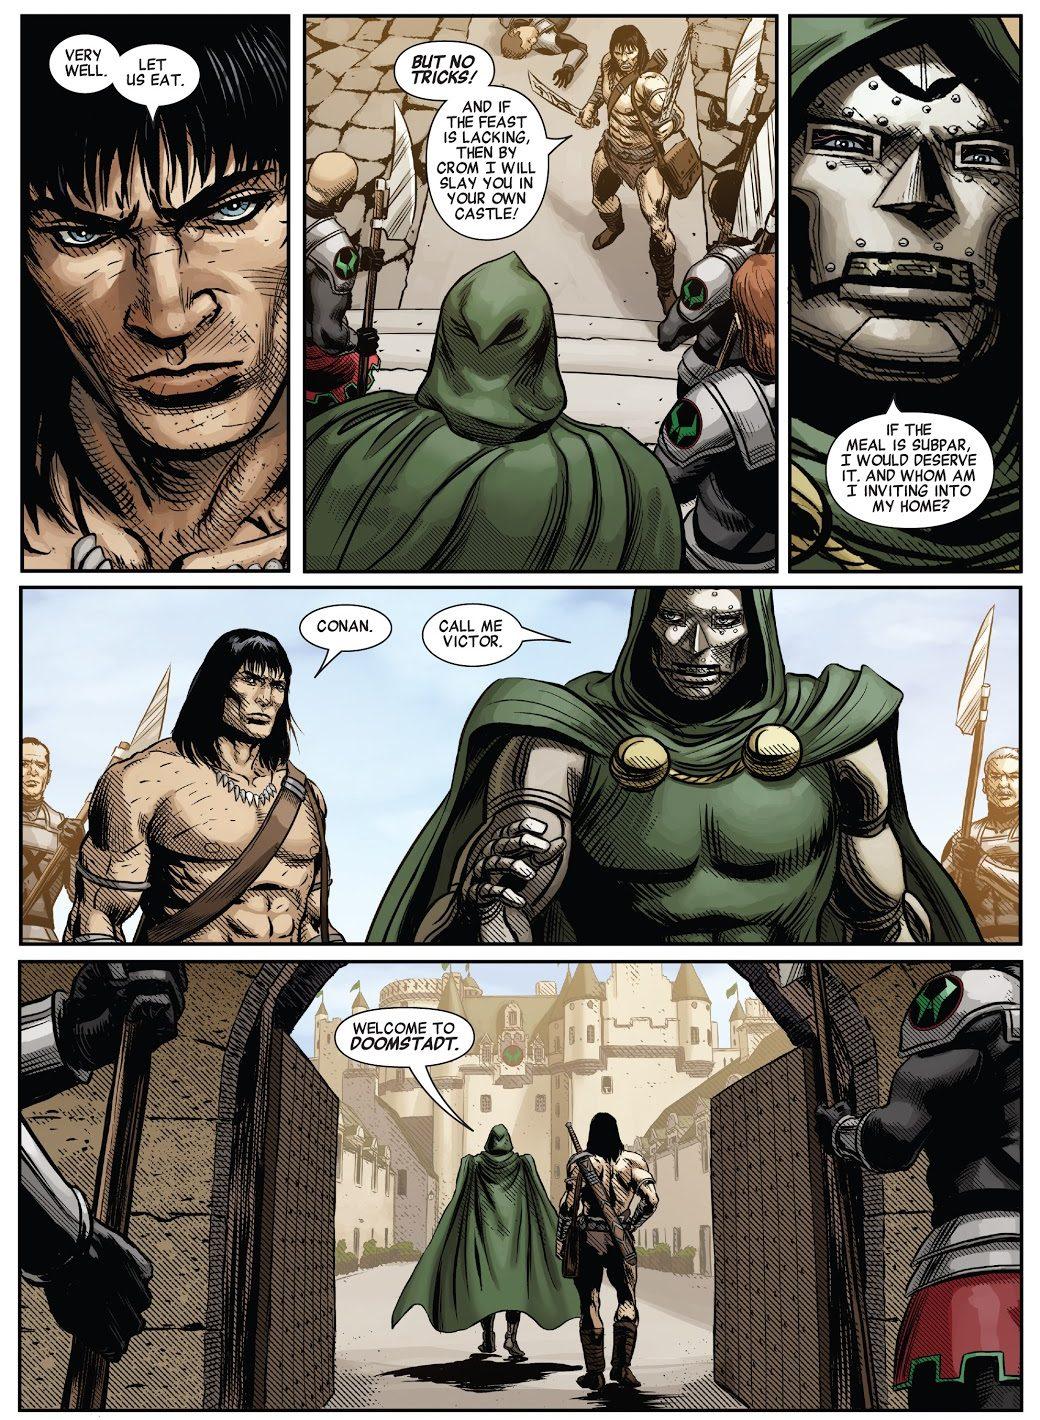 Conan The Barbarian Meets Doctor Doom